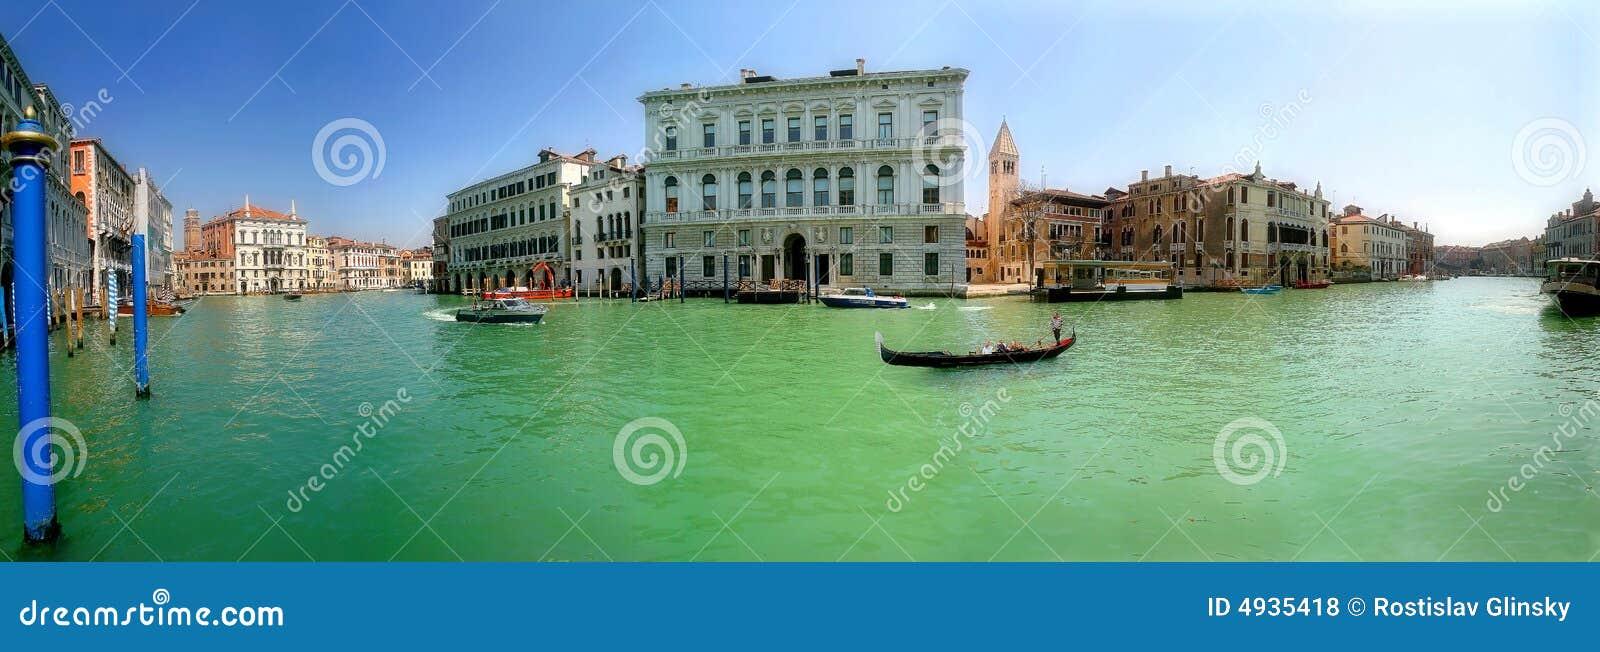 Veneza. Canal grande.